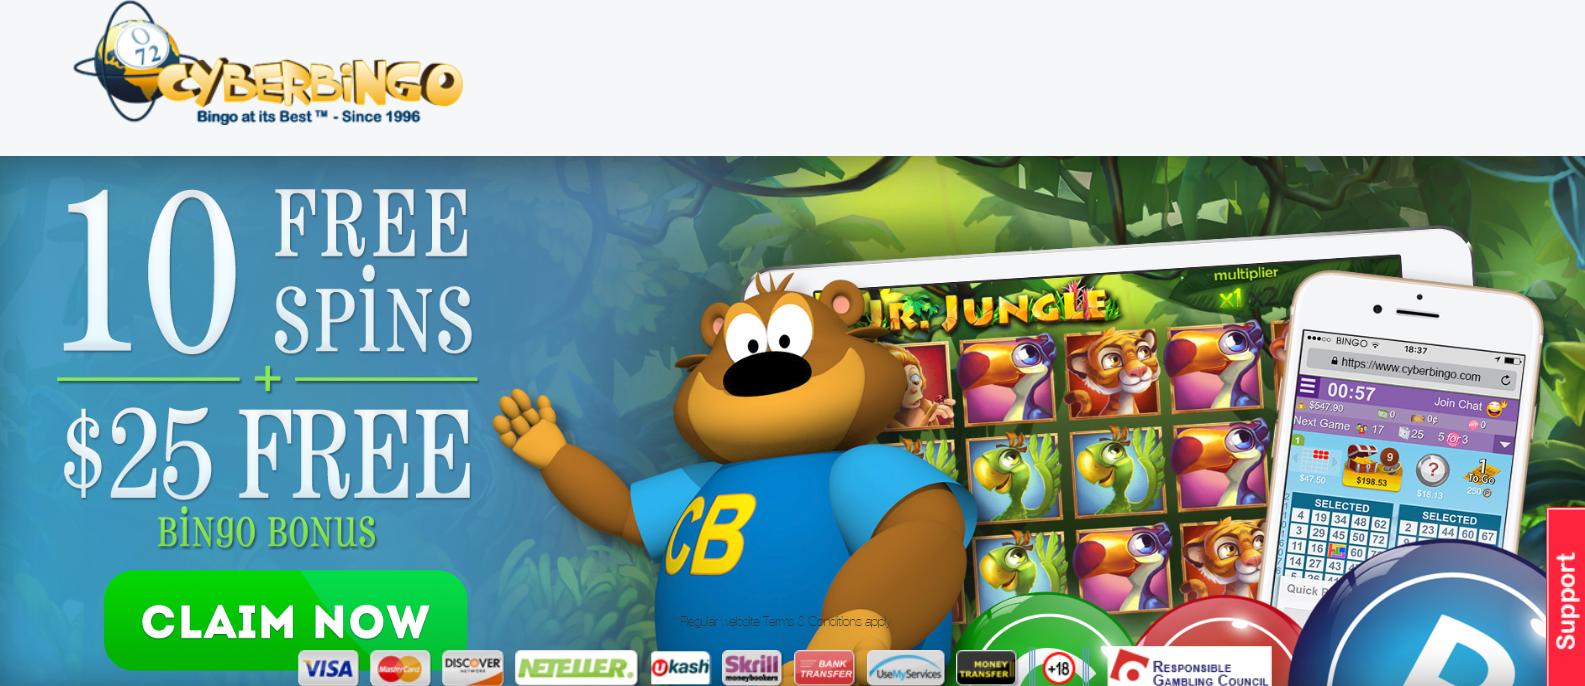 This great real money bingo and slot bonus is good for